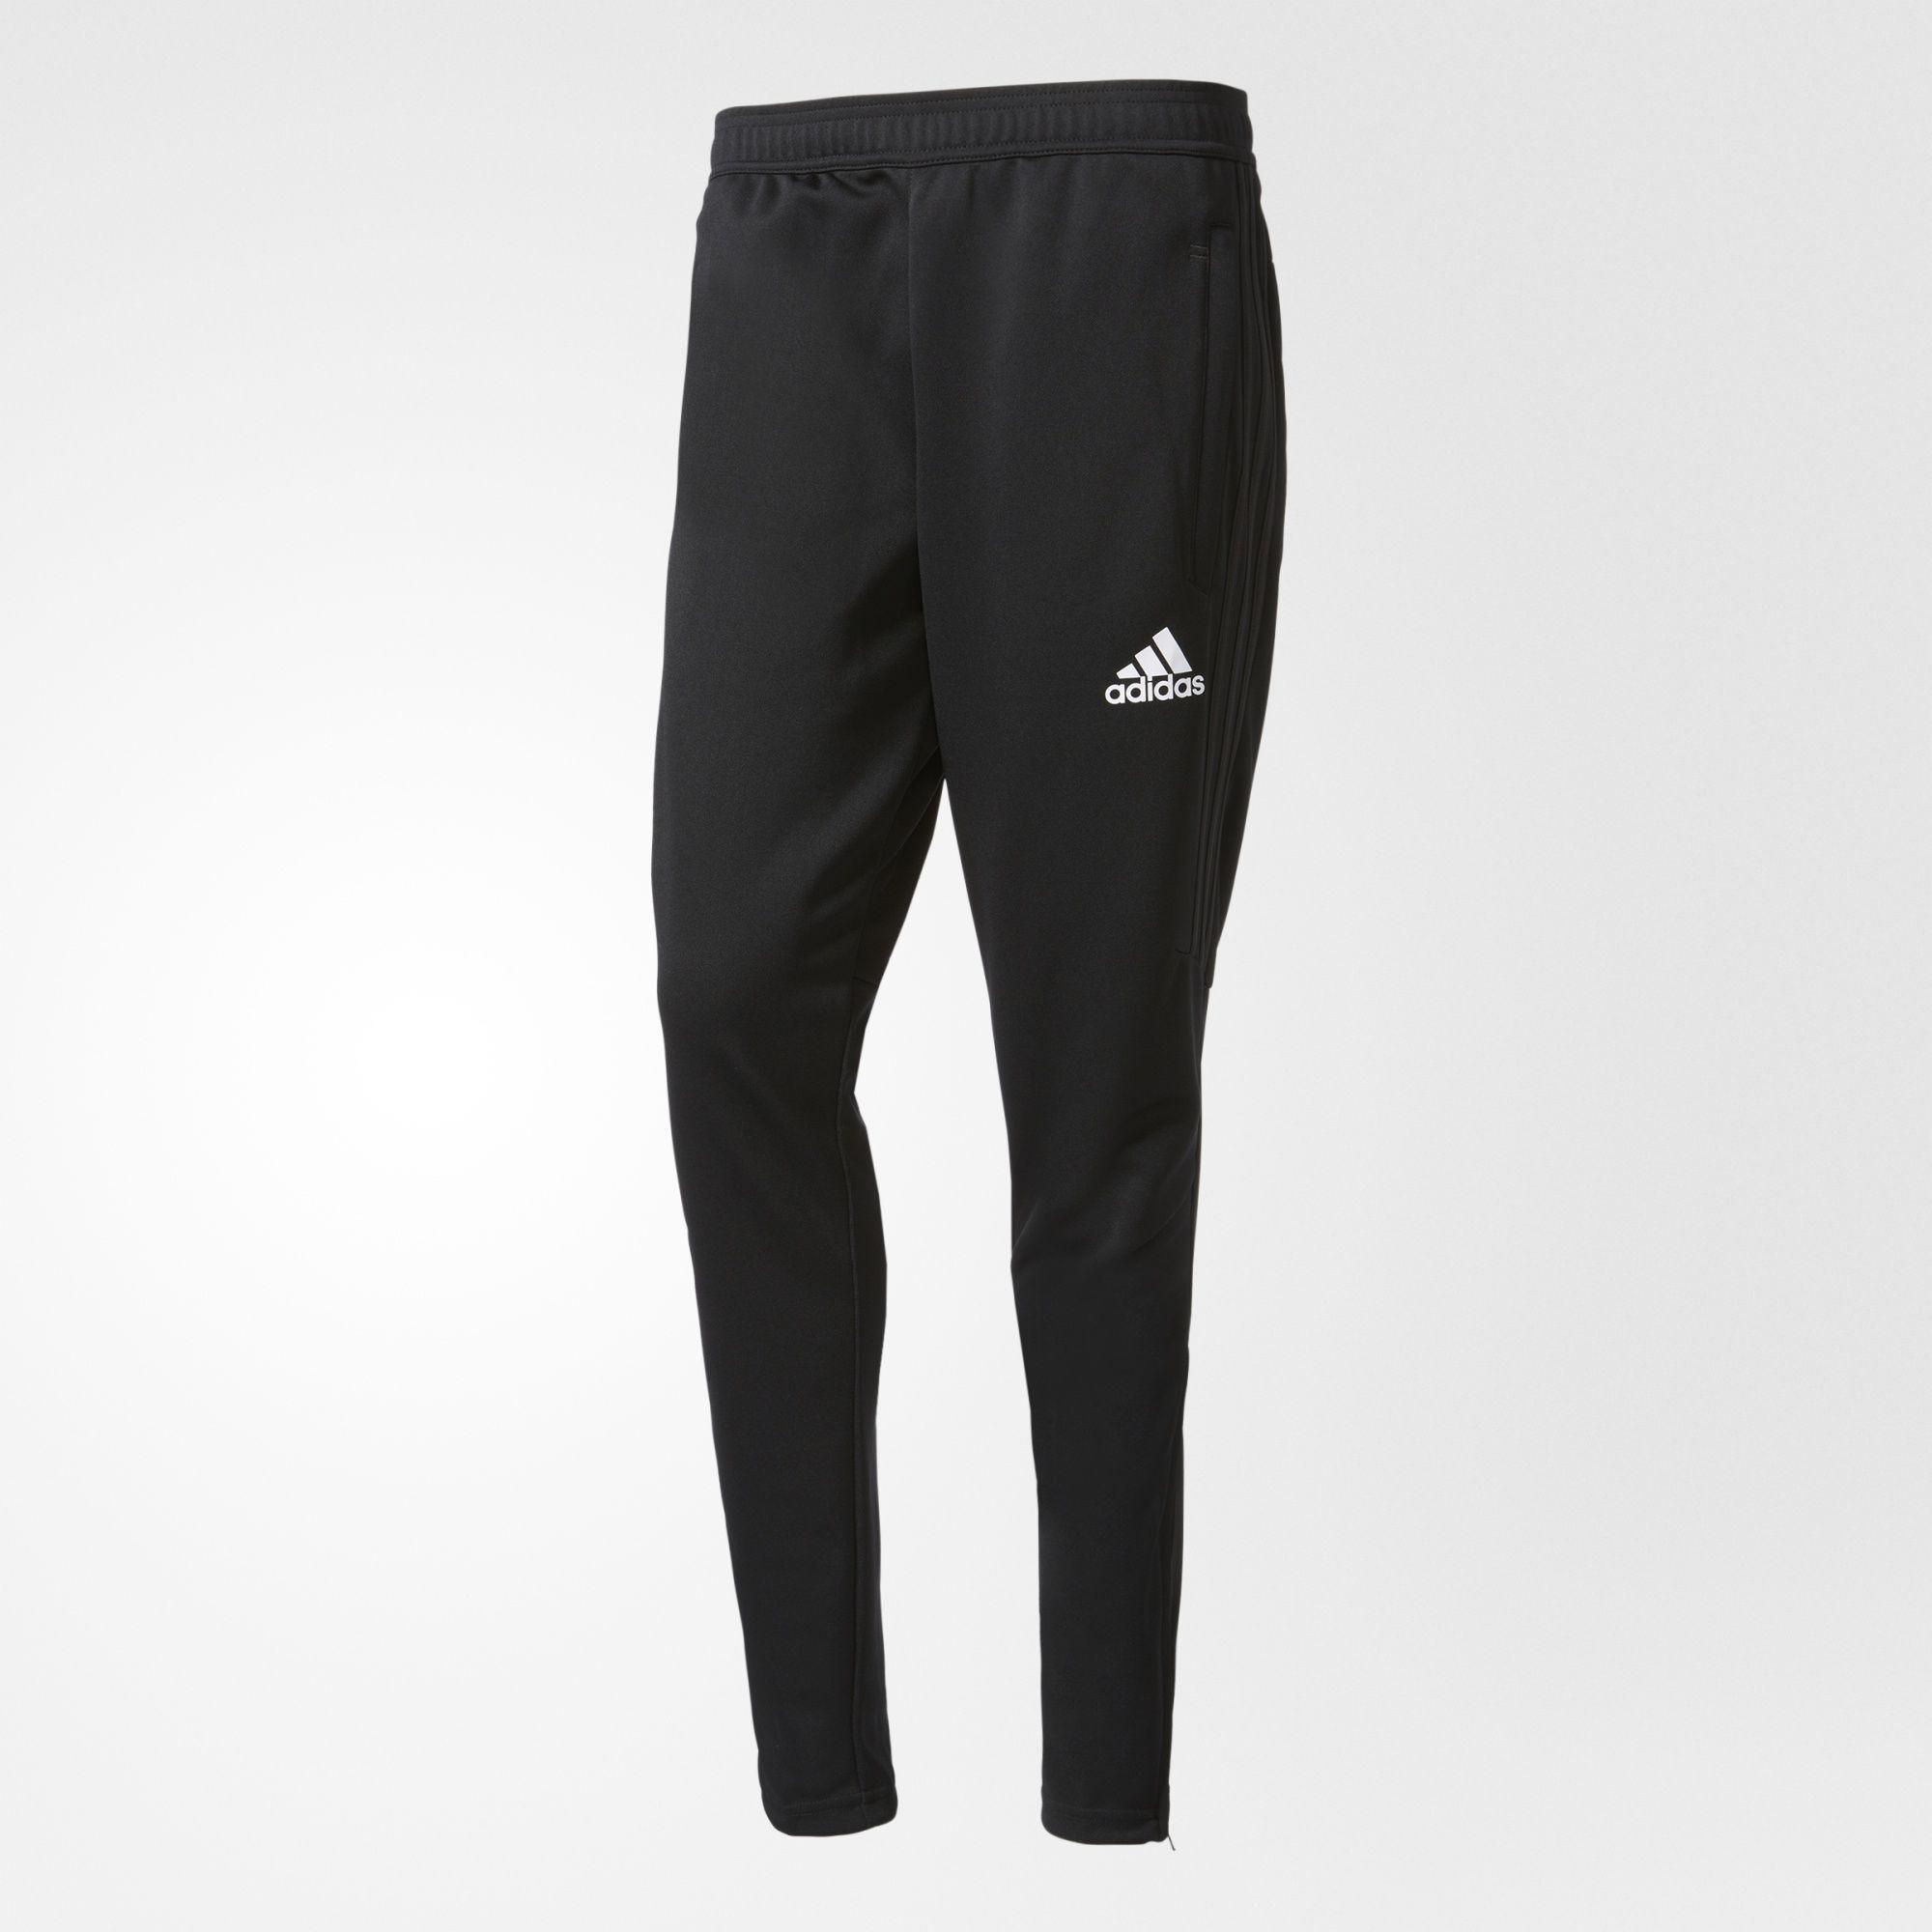 fed68a8802c46 adidas - Tiro 17 Training Pants Black / White BK0348   What   Pants ...